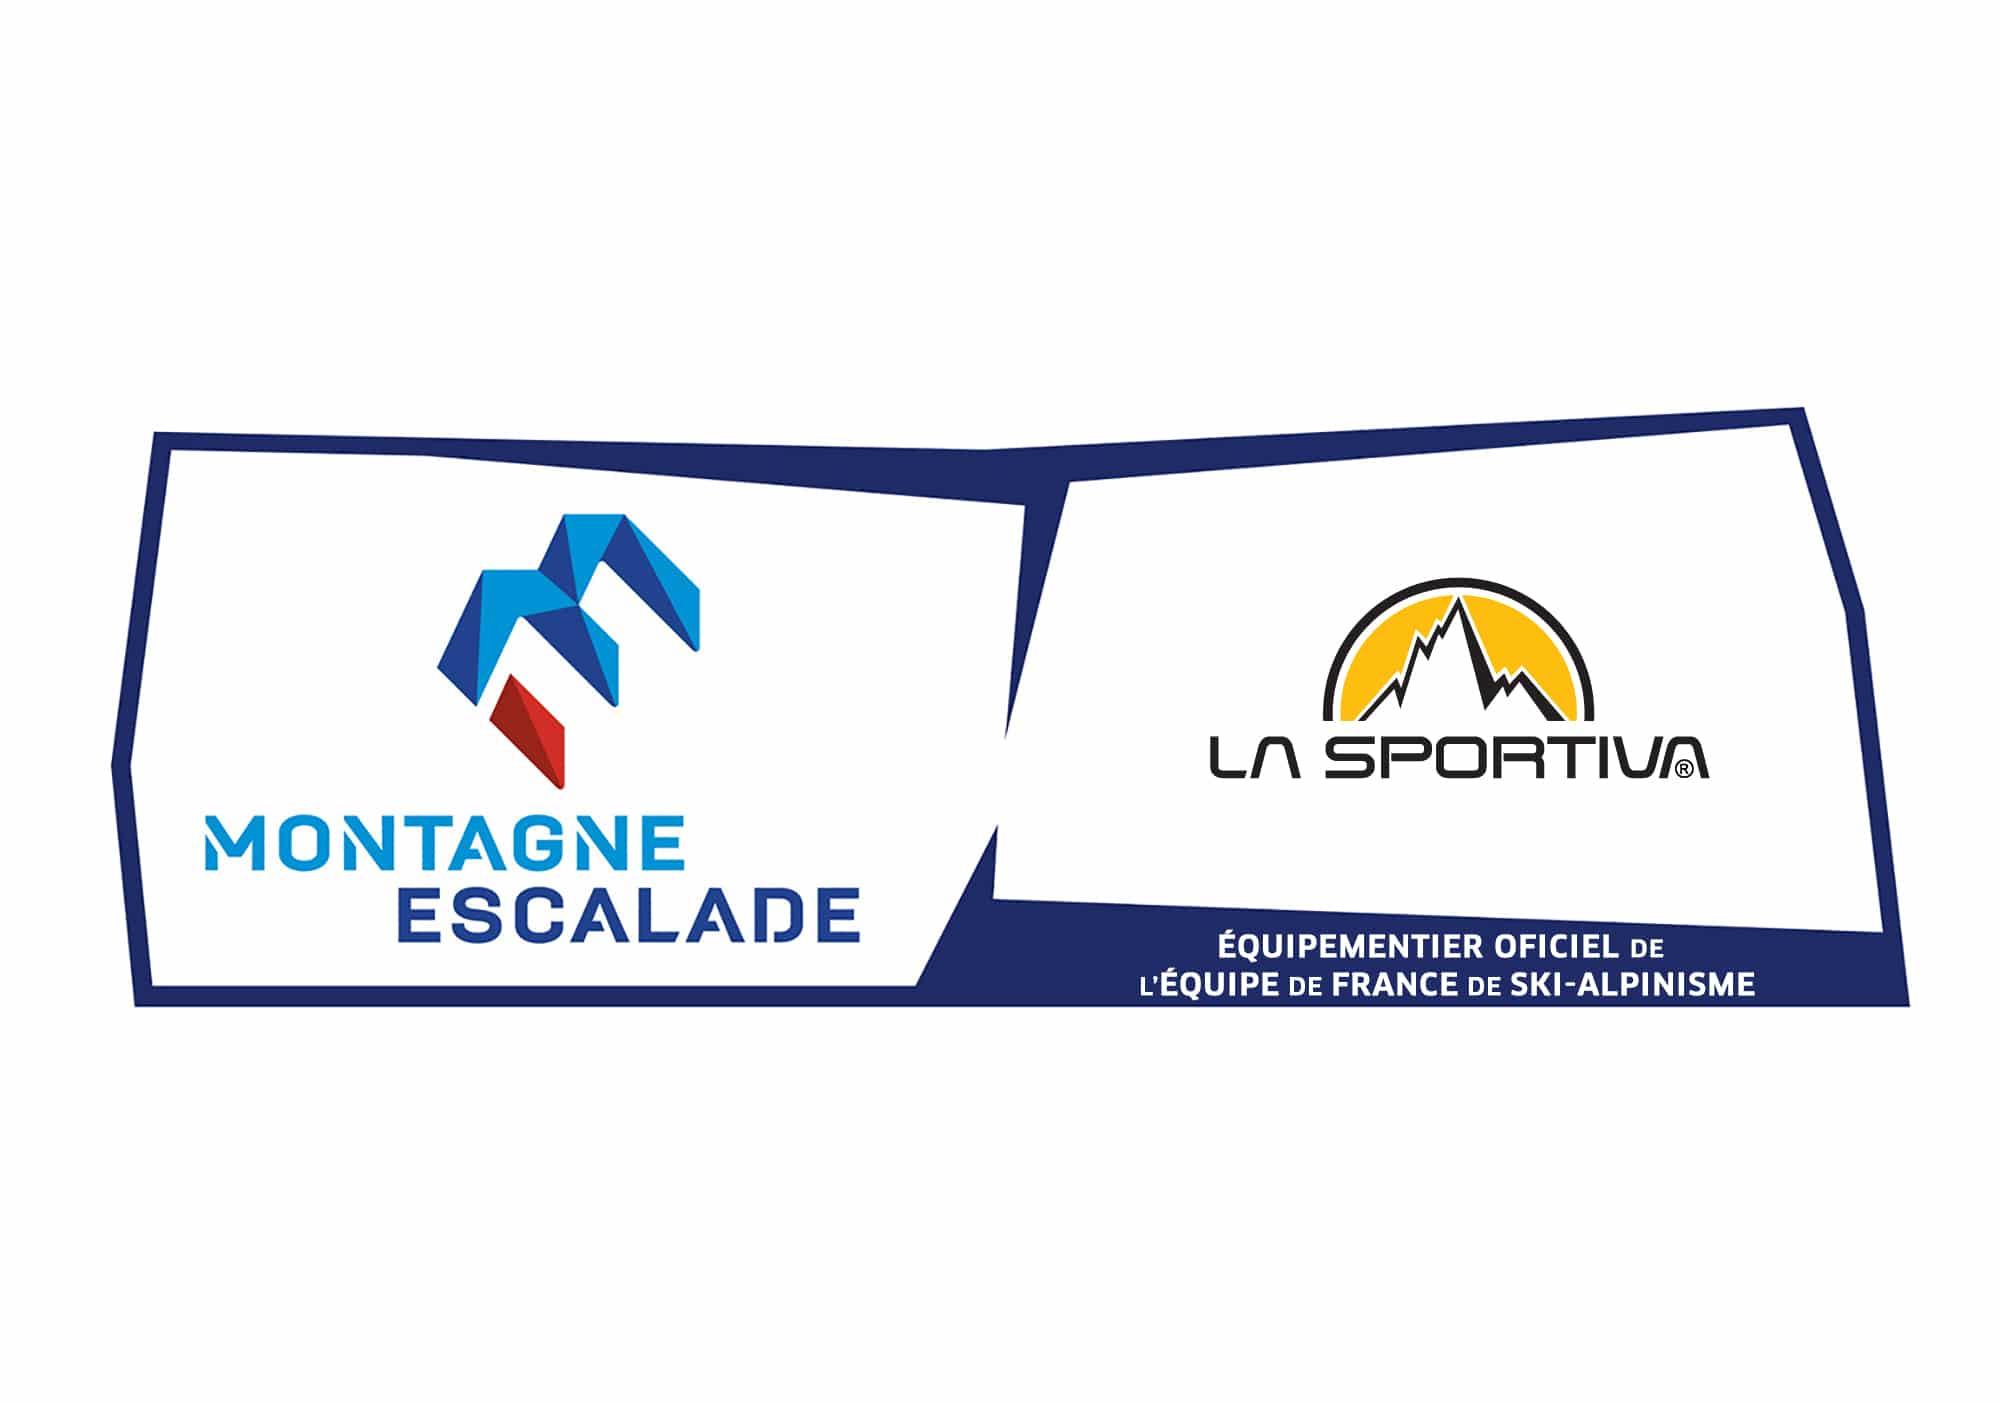 La Sportiva, équipementier de l'équipe de France de ski-alpinisme jusqu'en 2024